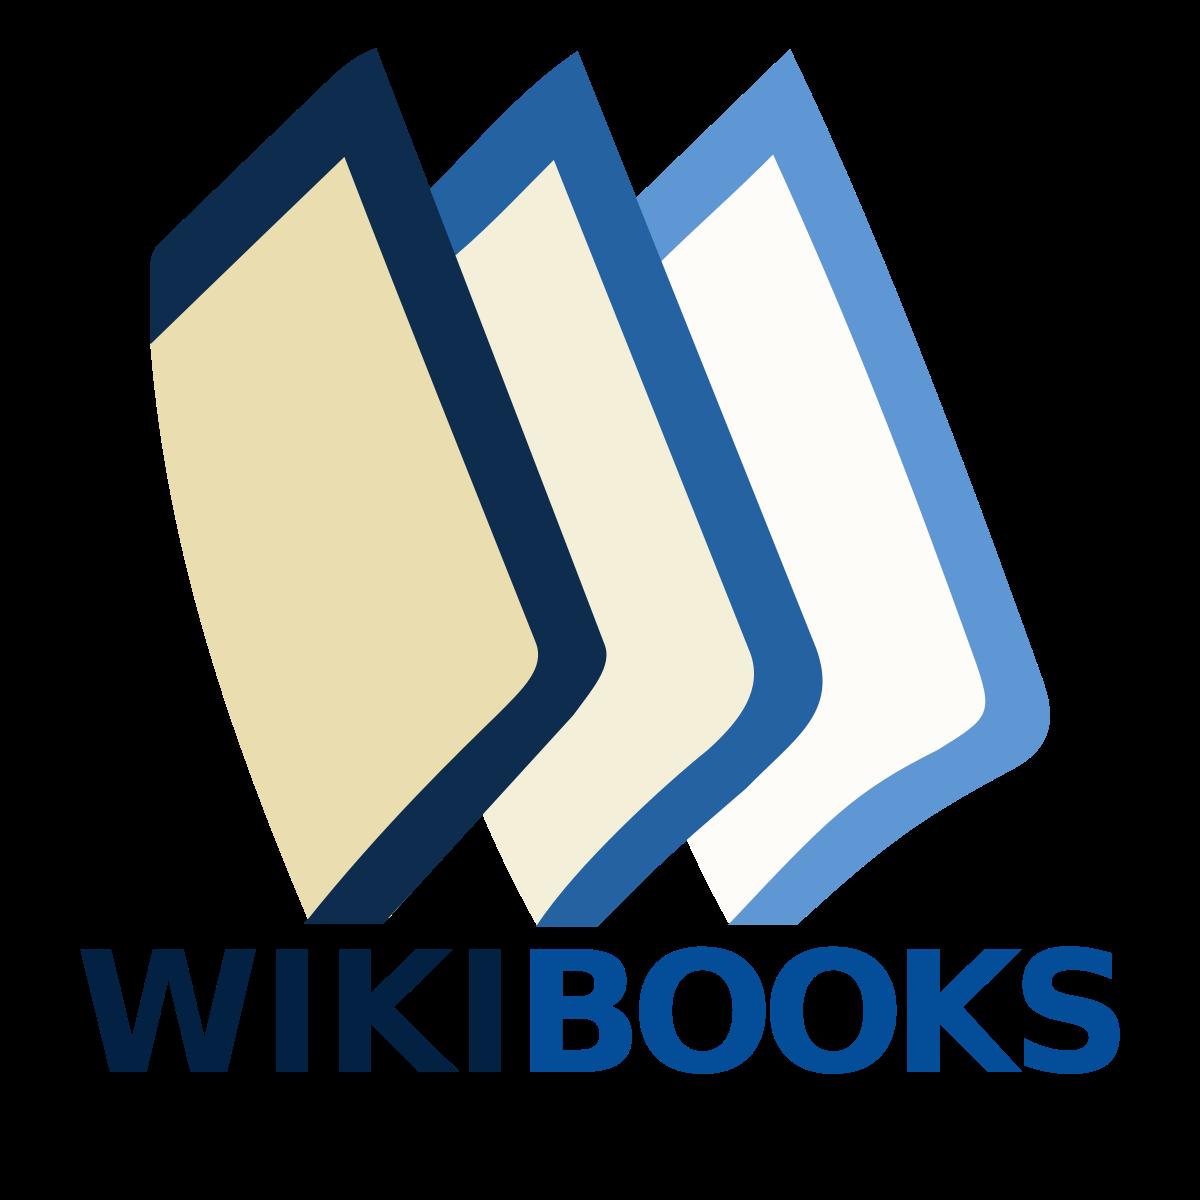 KVPATTOM LIBRARY ON PHONE Website: WikiBooks Link Thumbnail | Linktree